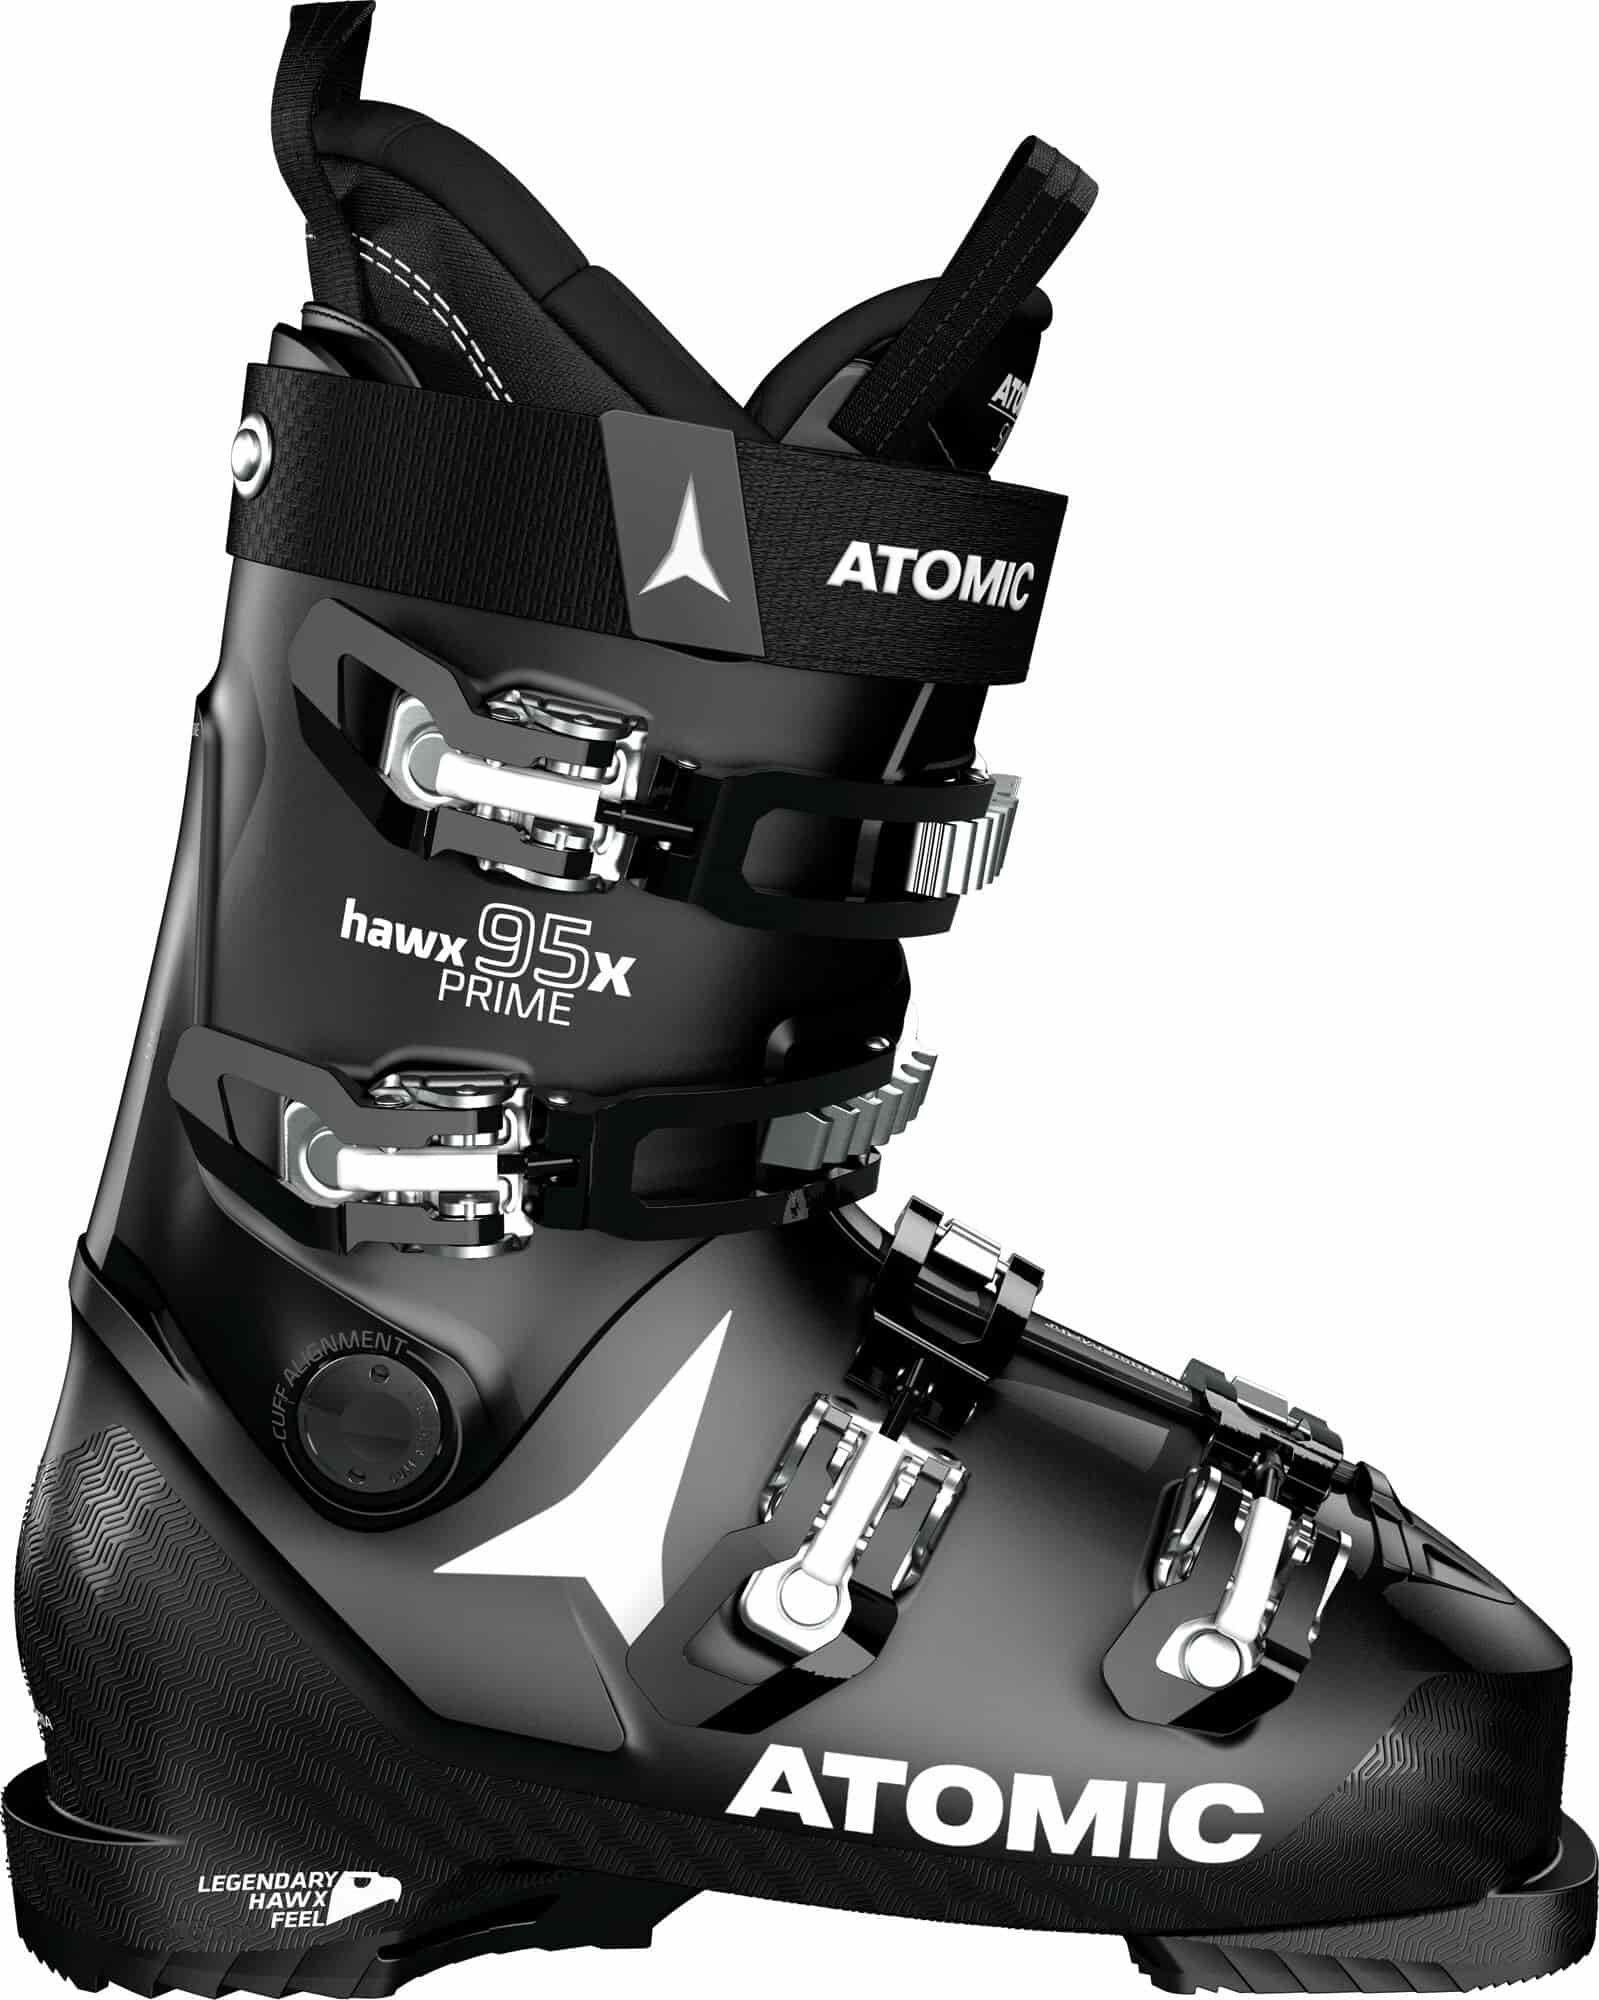 Atomic Hawx Prime 95X W